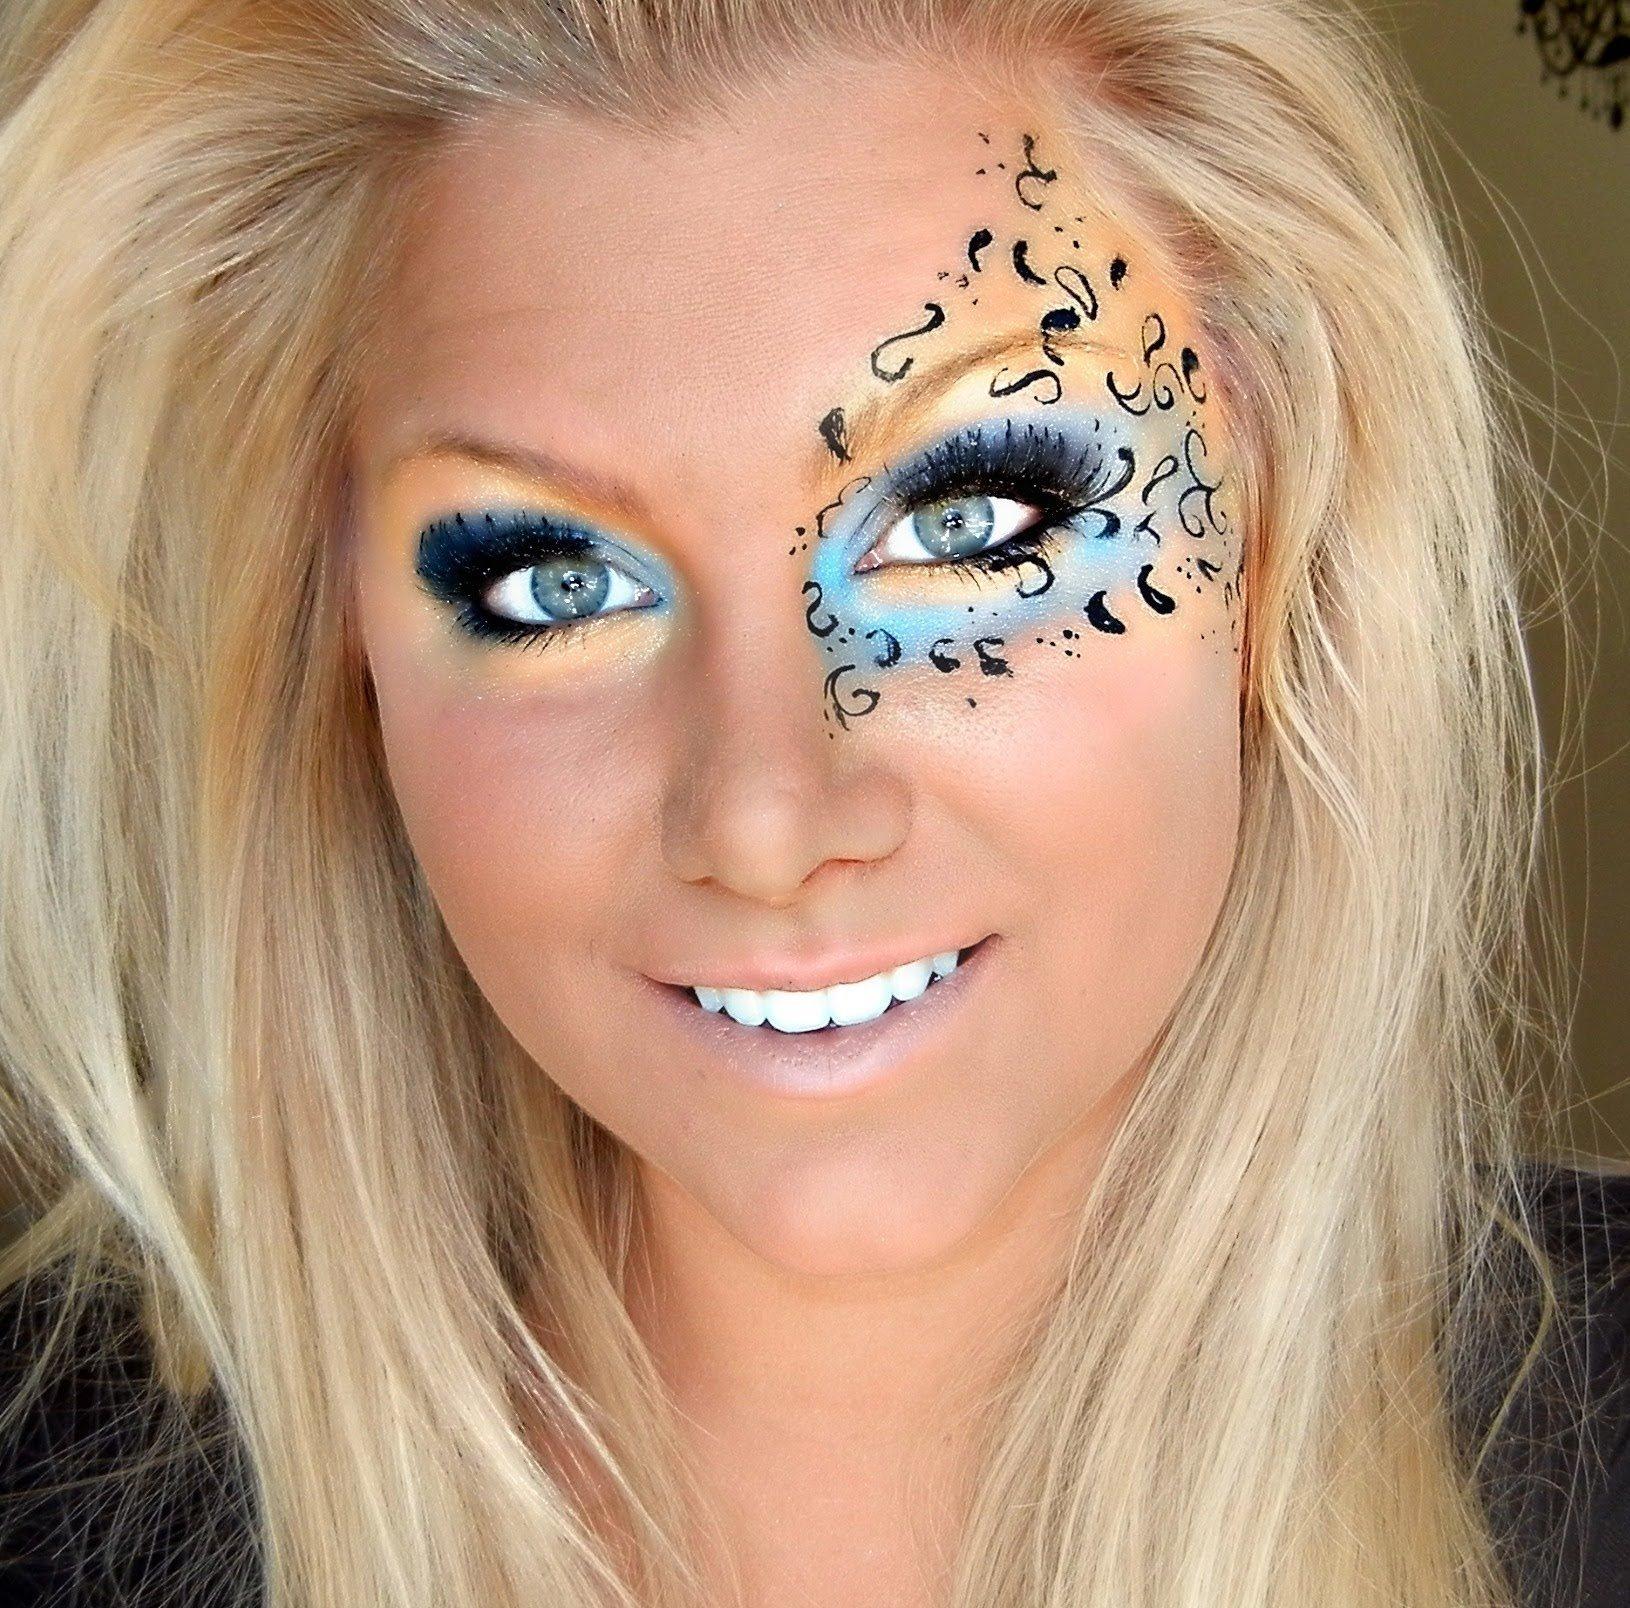 10 Wonderful Mardi Gras Face Painting Ideas mardi gras eye makeup face makeup ideas 2020